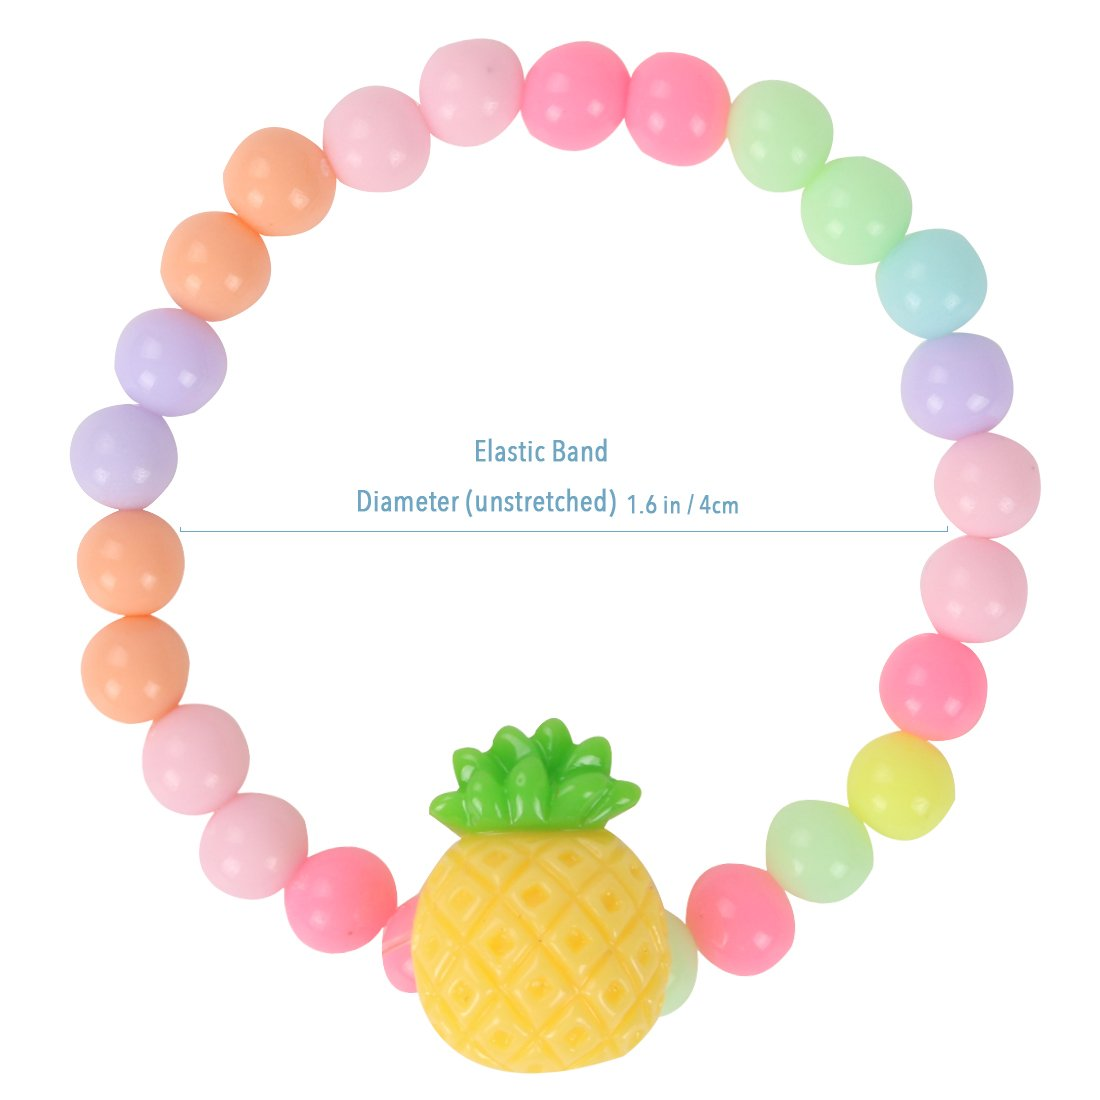 kilofly 6 Sets Princess Party Favors Girls Jewelry Rings Elastic Bracelets Pack by kilofly (Image #5)